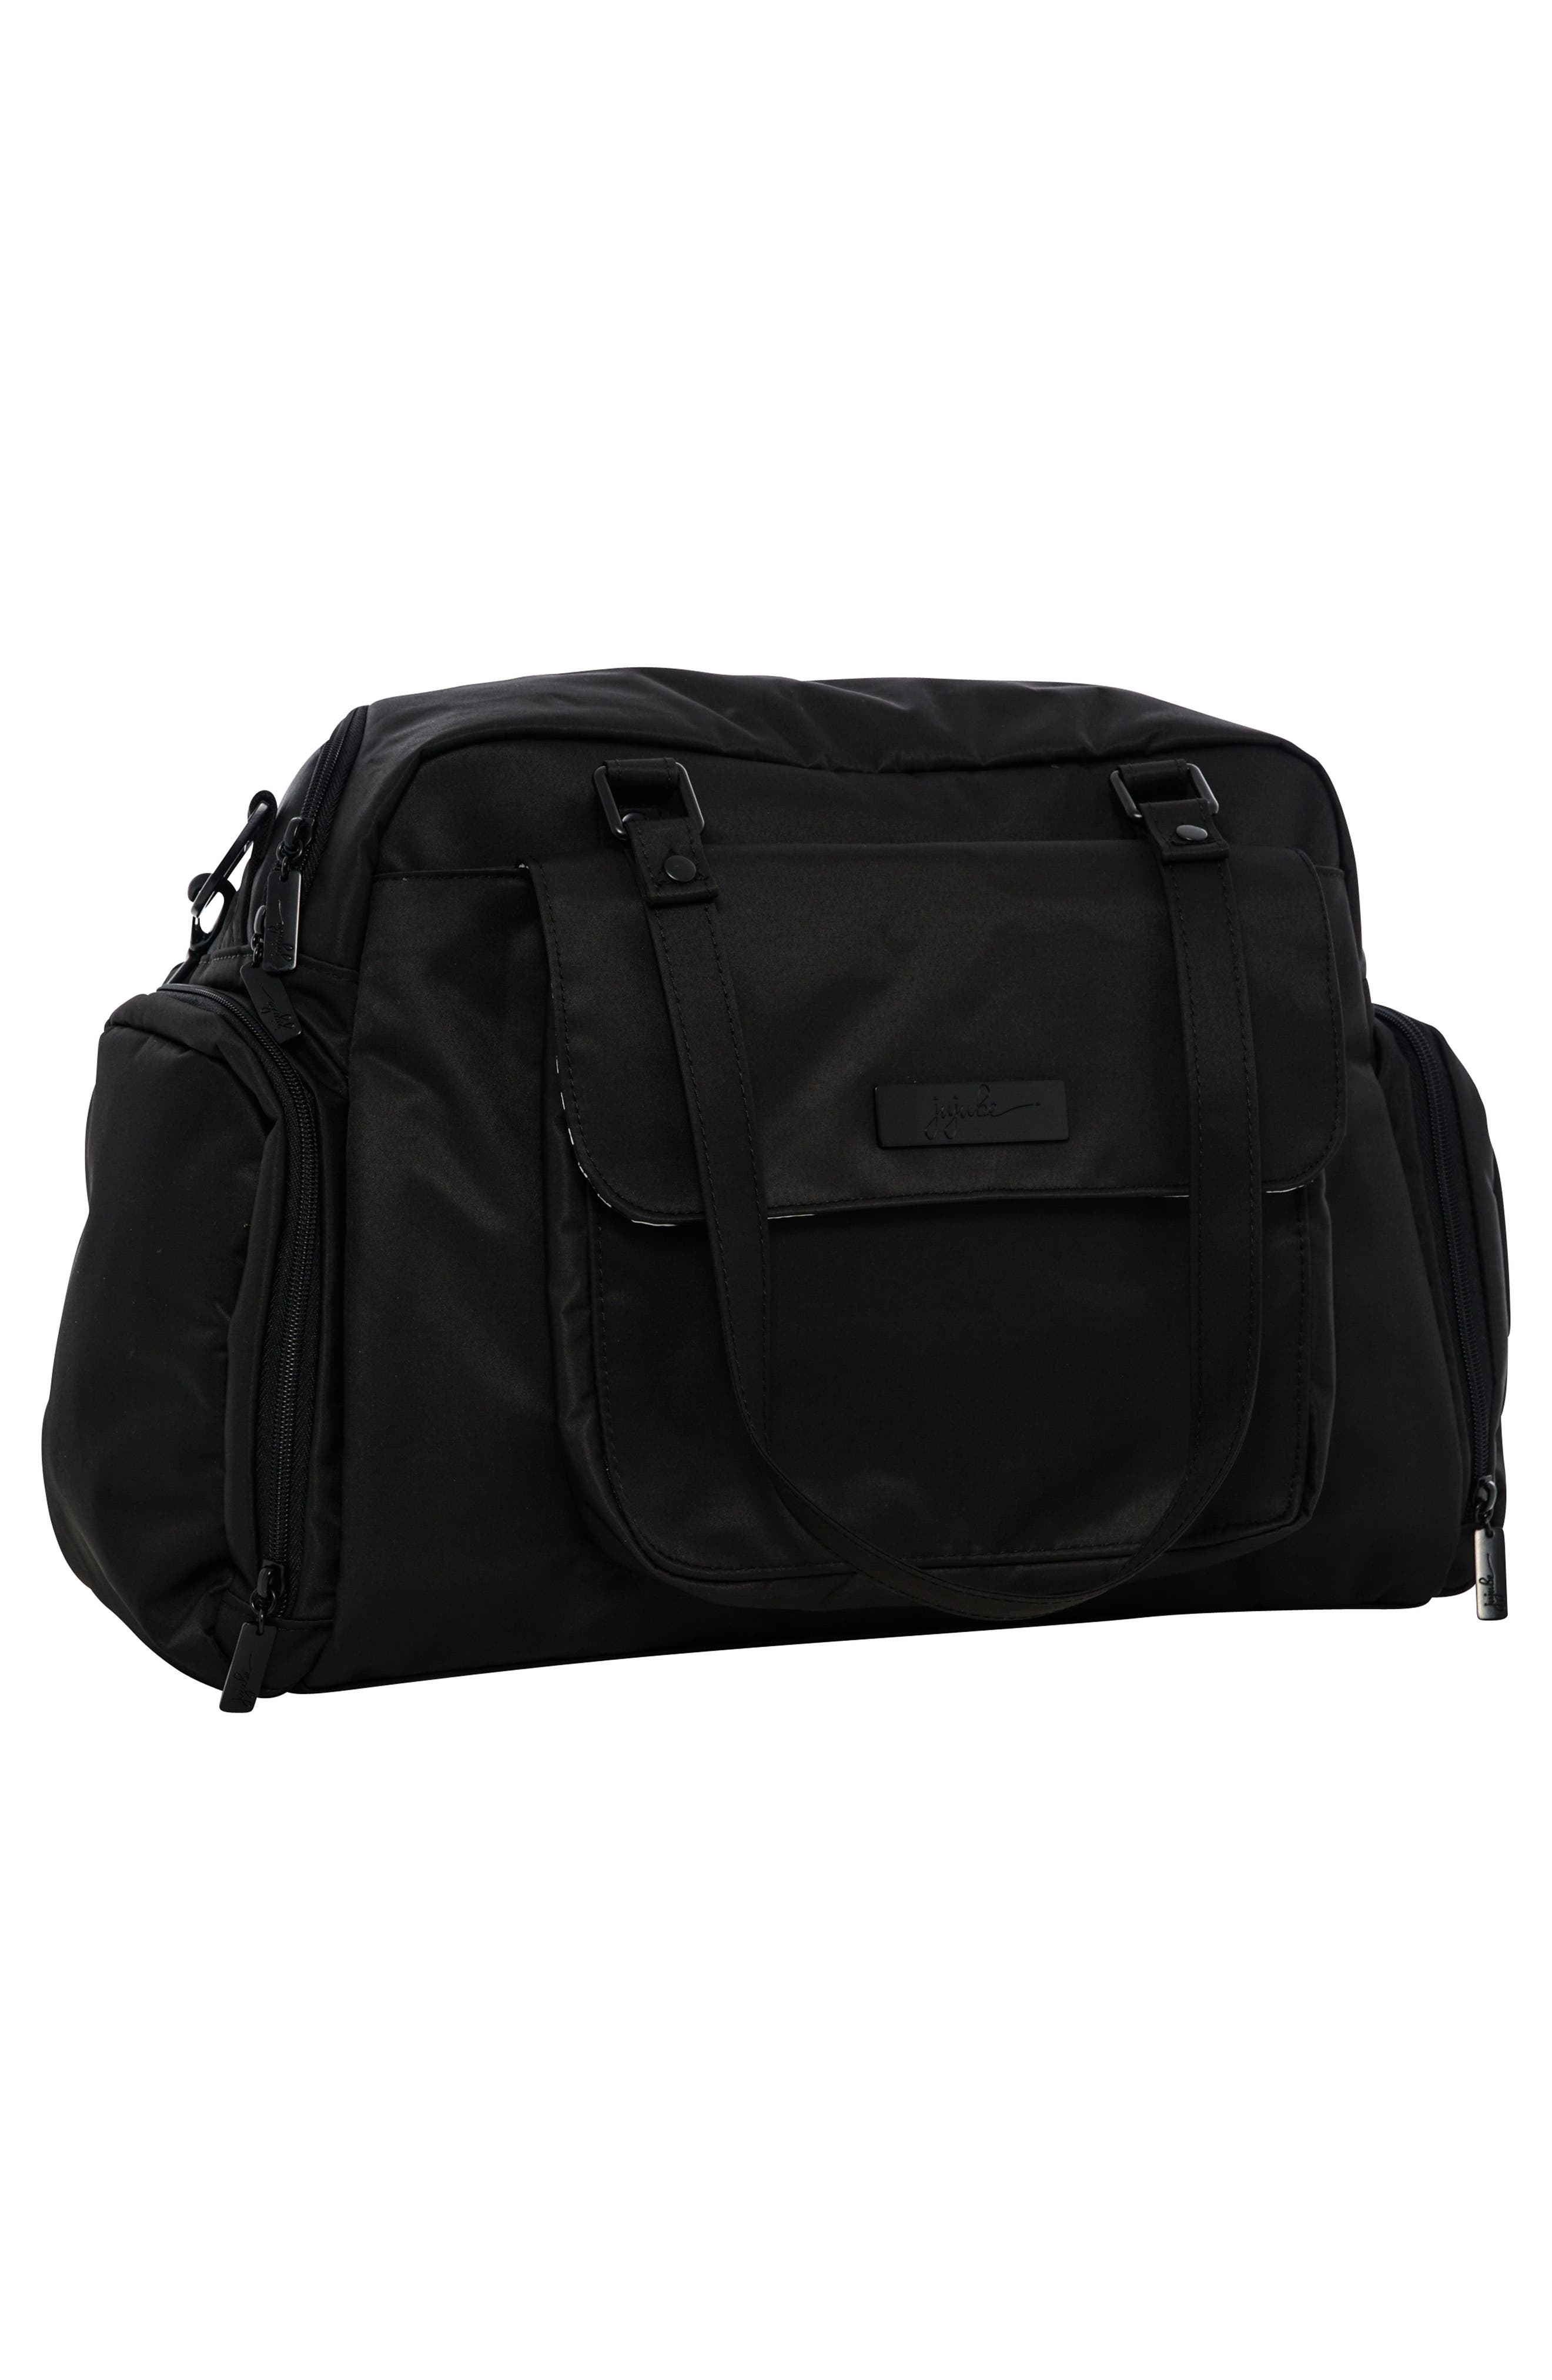 Onyx Be Pumped Bag,                             Alternate thumbnail 6, color,                             001